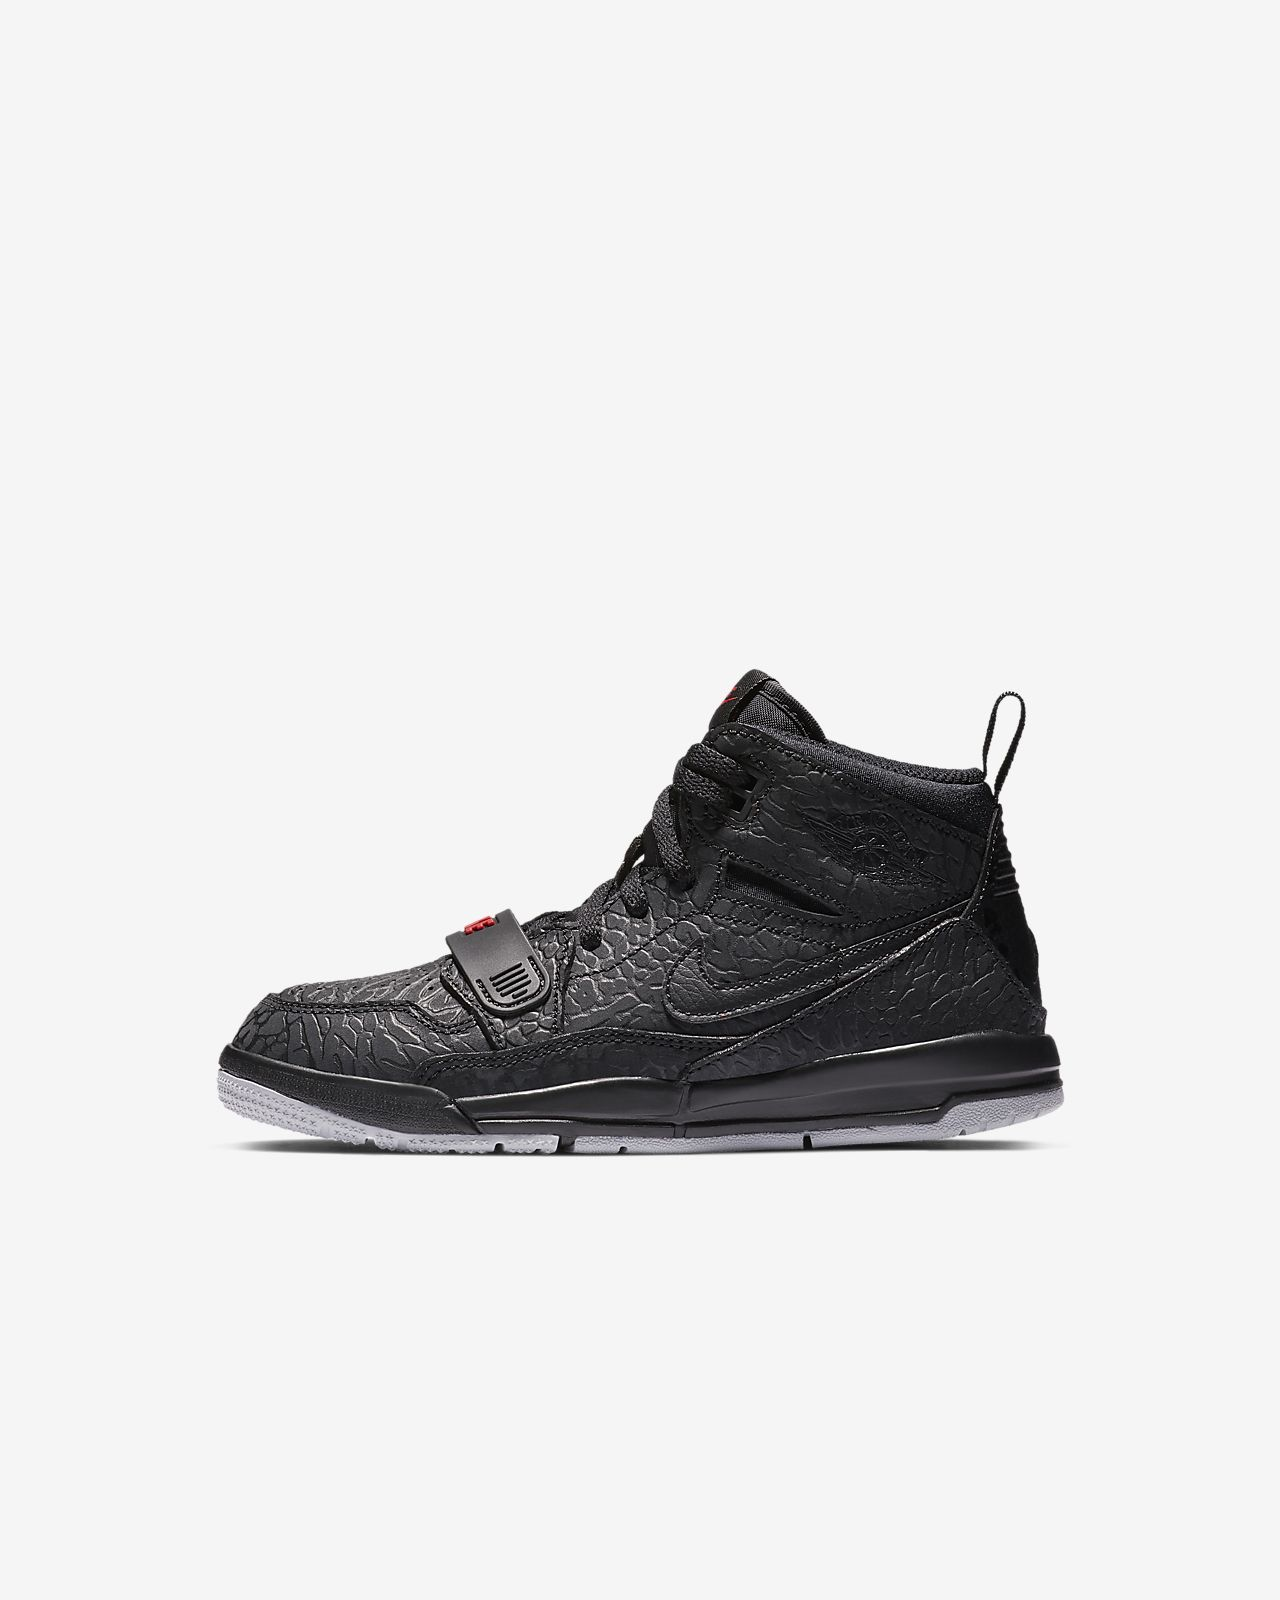 buy popular d2dd7 210f3 ... Air Jordan Legacy 312 Schuh für jüngere Kinder